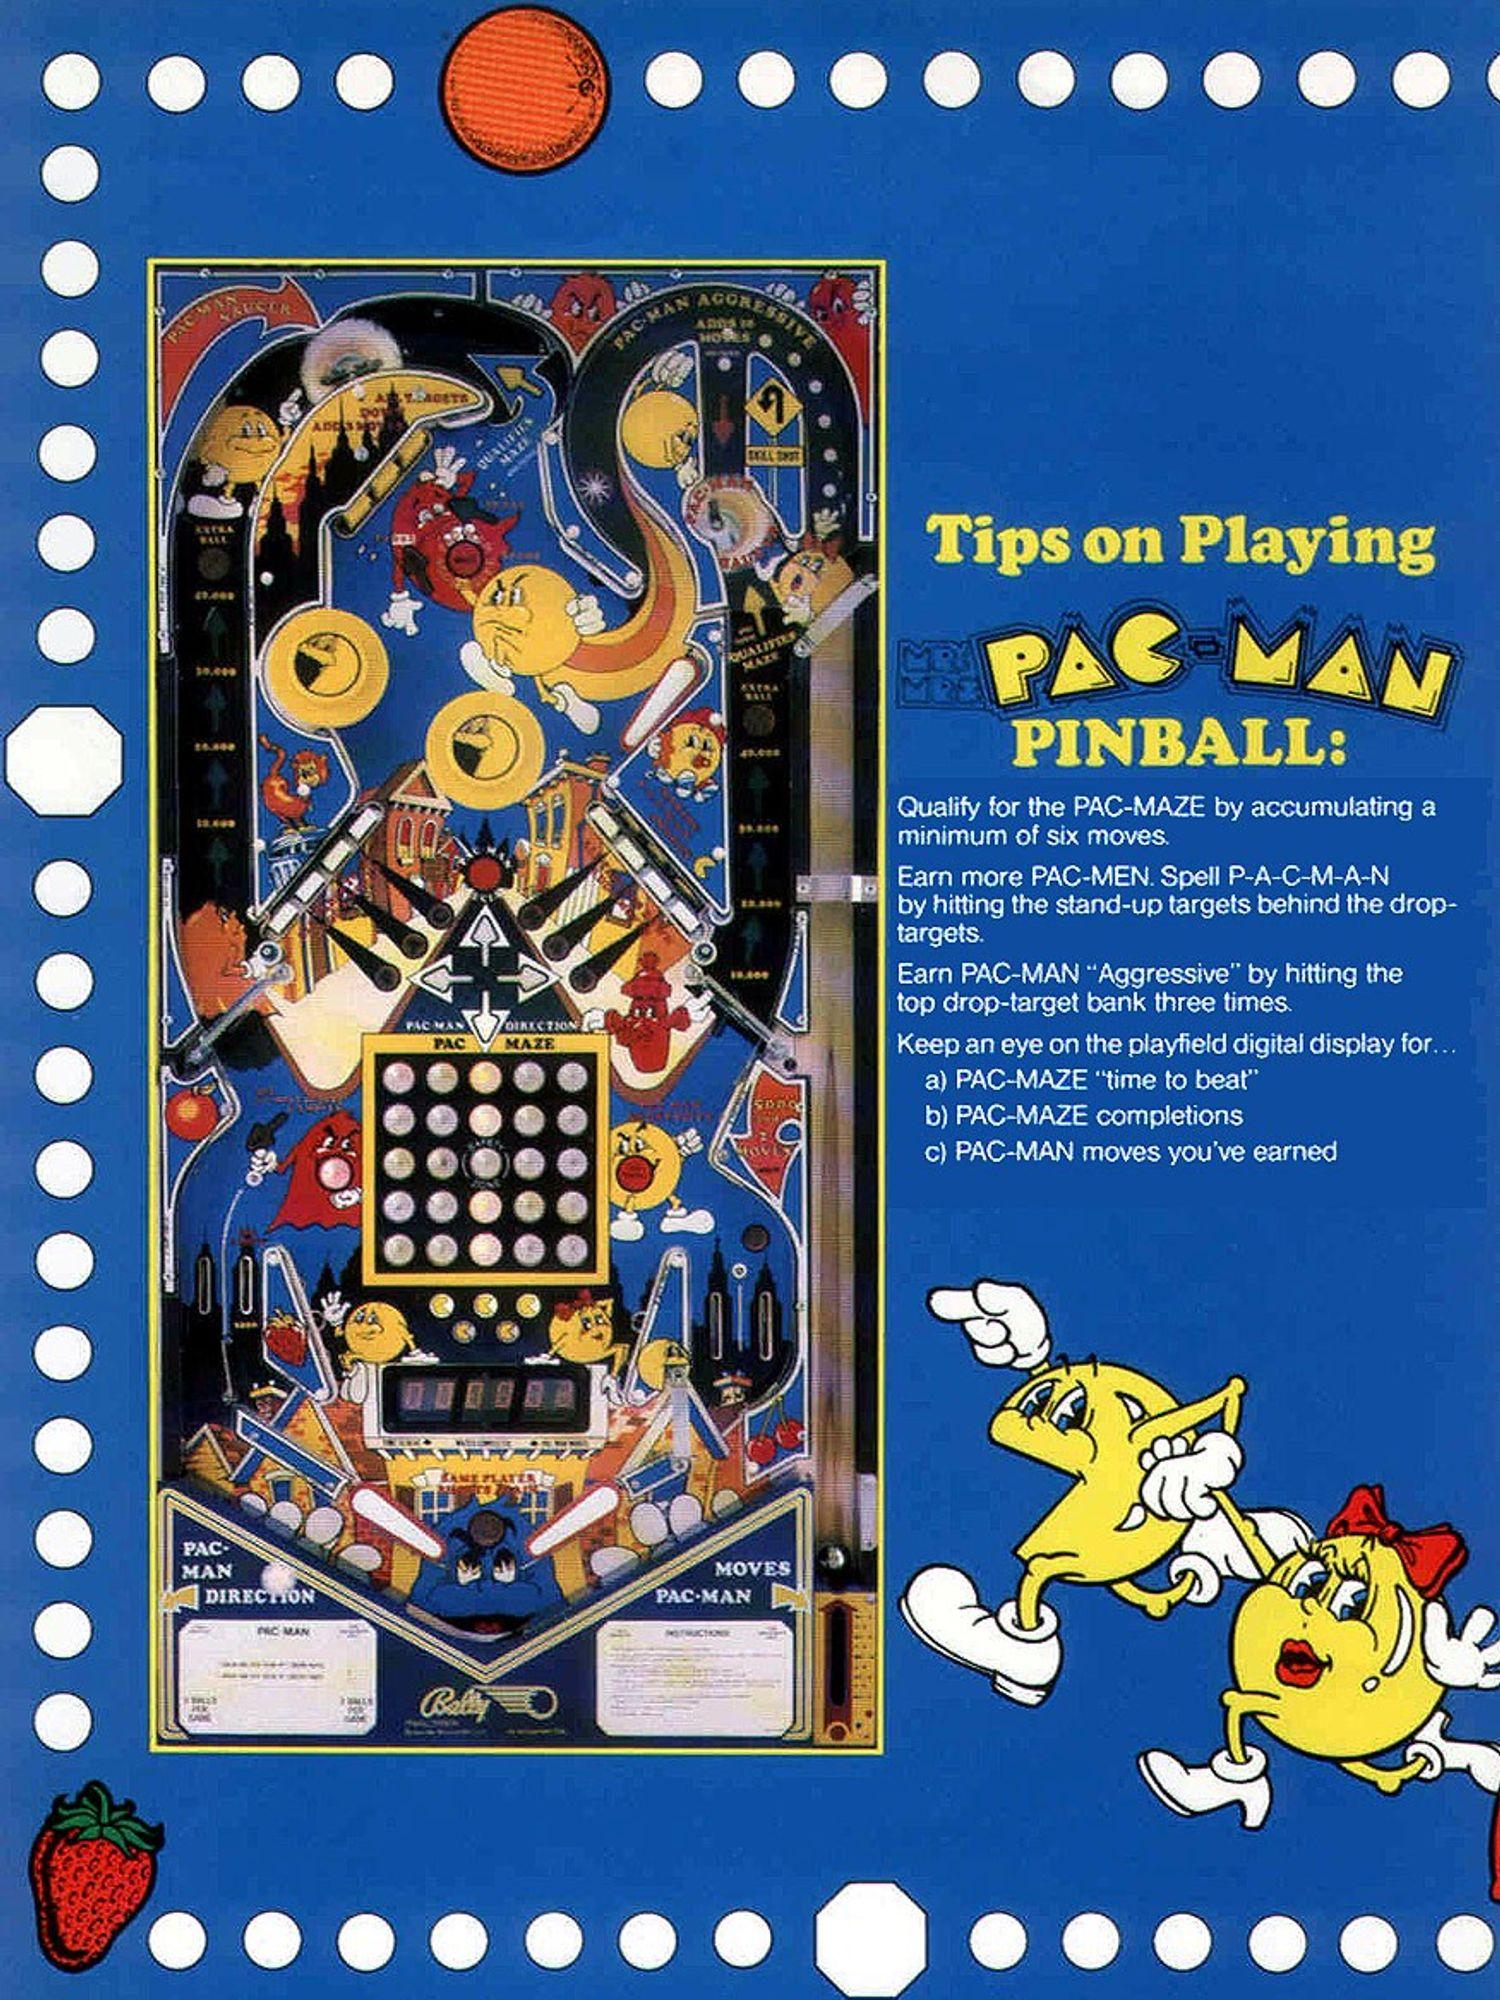 Mr. & Mrs. Pac-Man Flyer 2